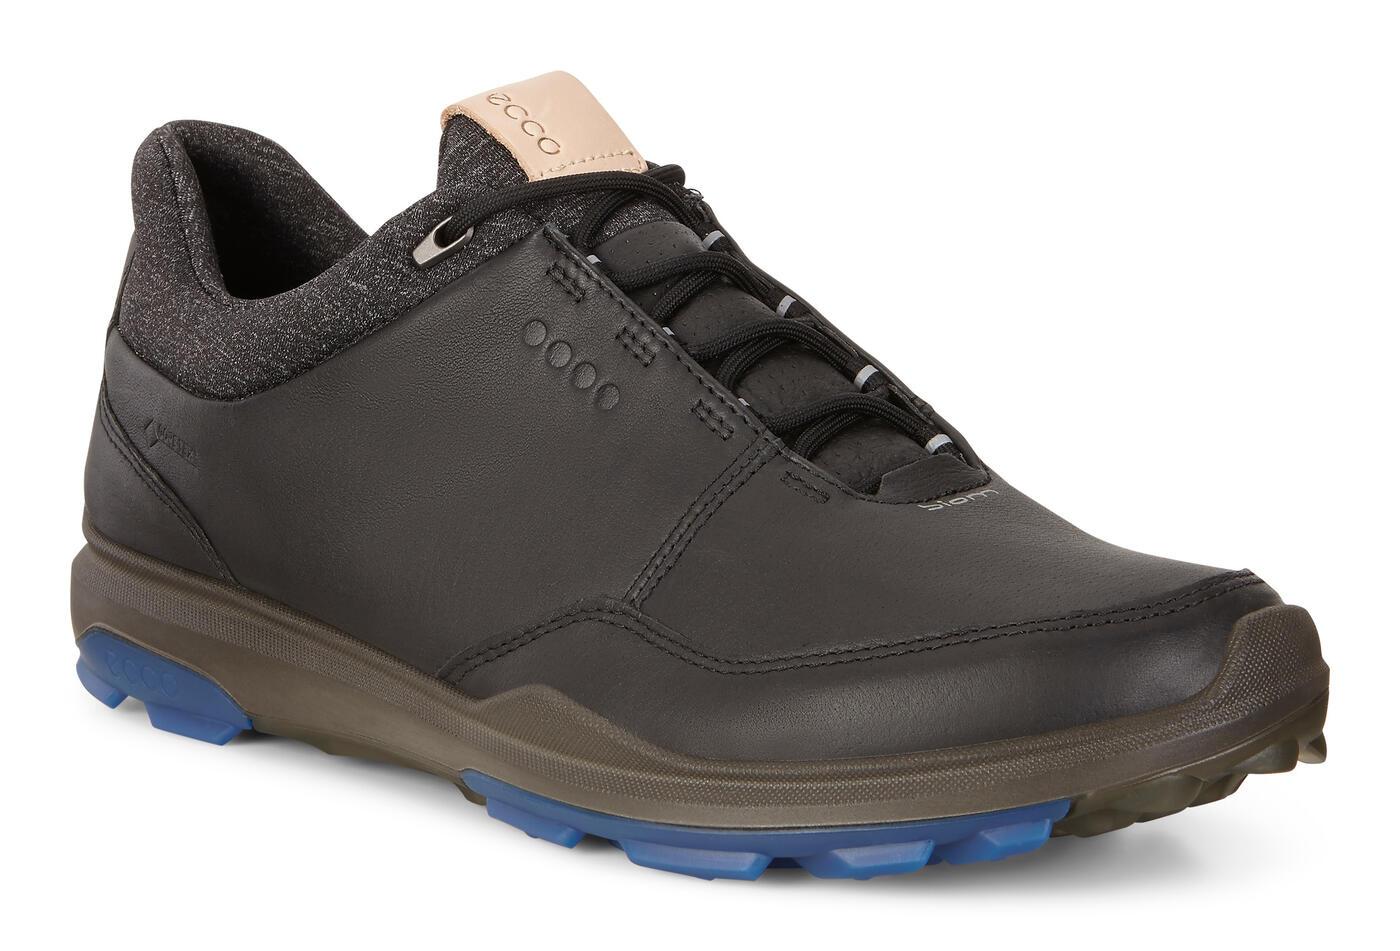 Chaussure ECCO BIOM HYBRID 3 GTX pour hommes